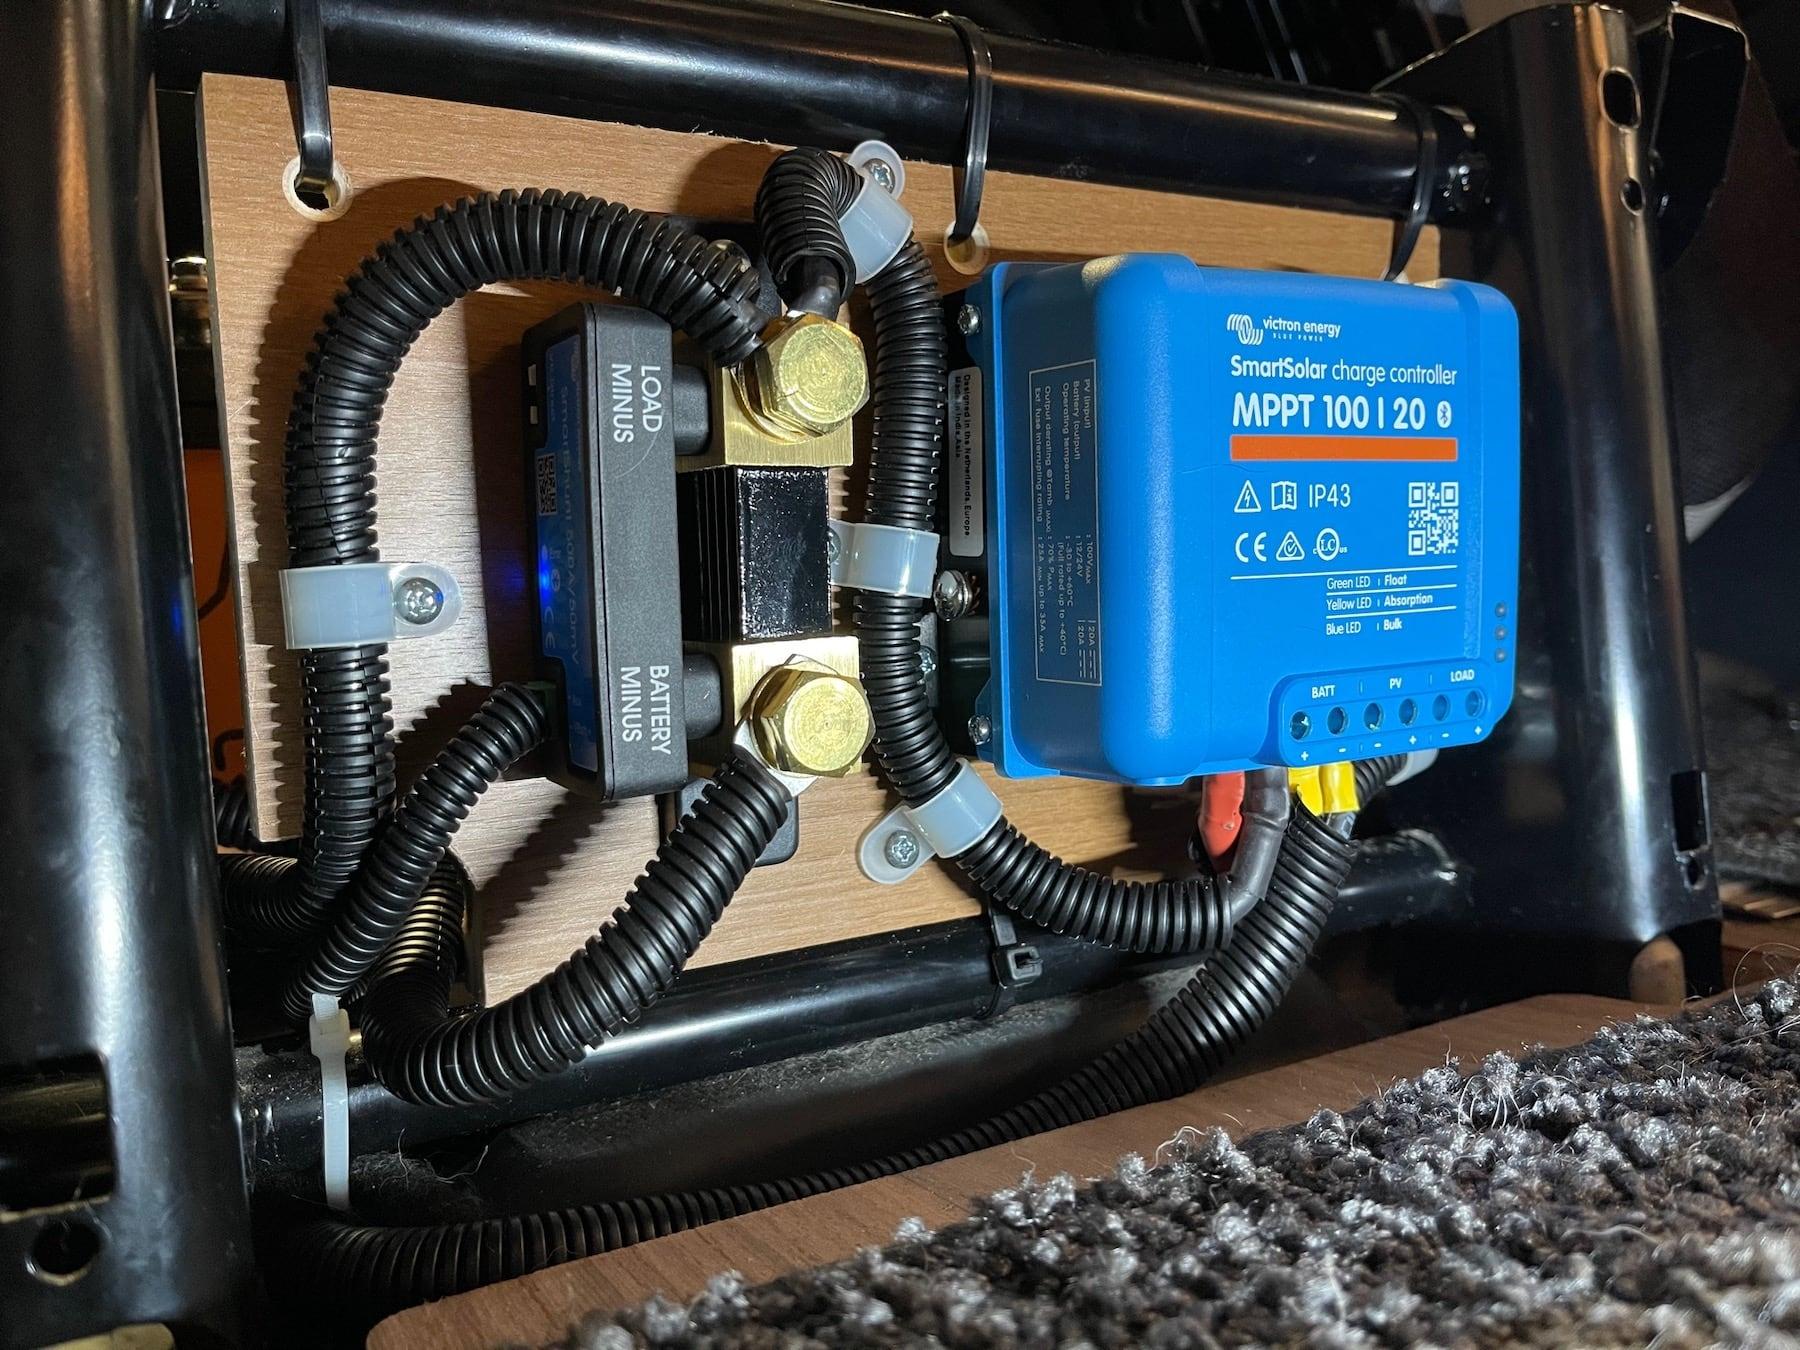 Voltronic Batterie Management System Lithium Batterie für Wohnmobile